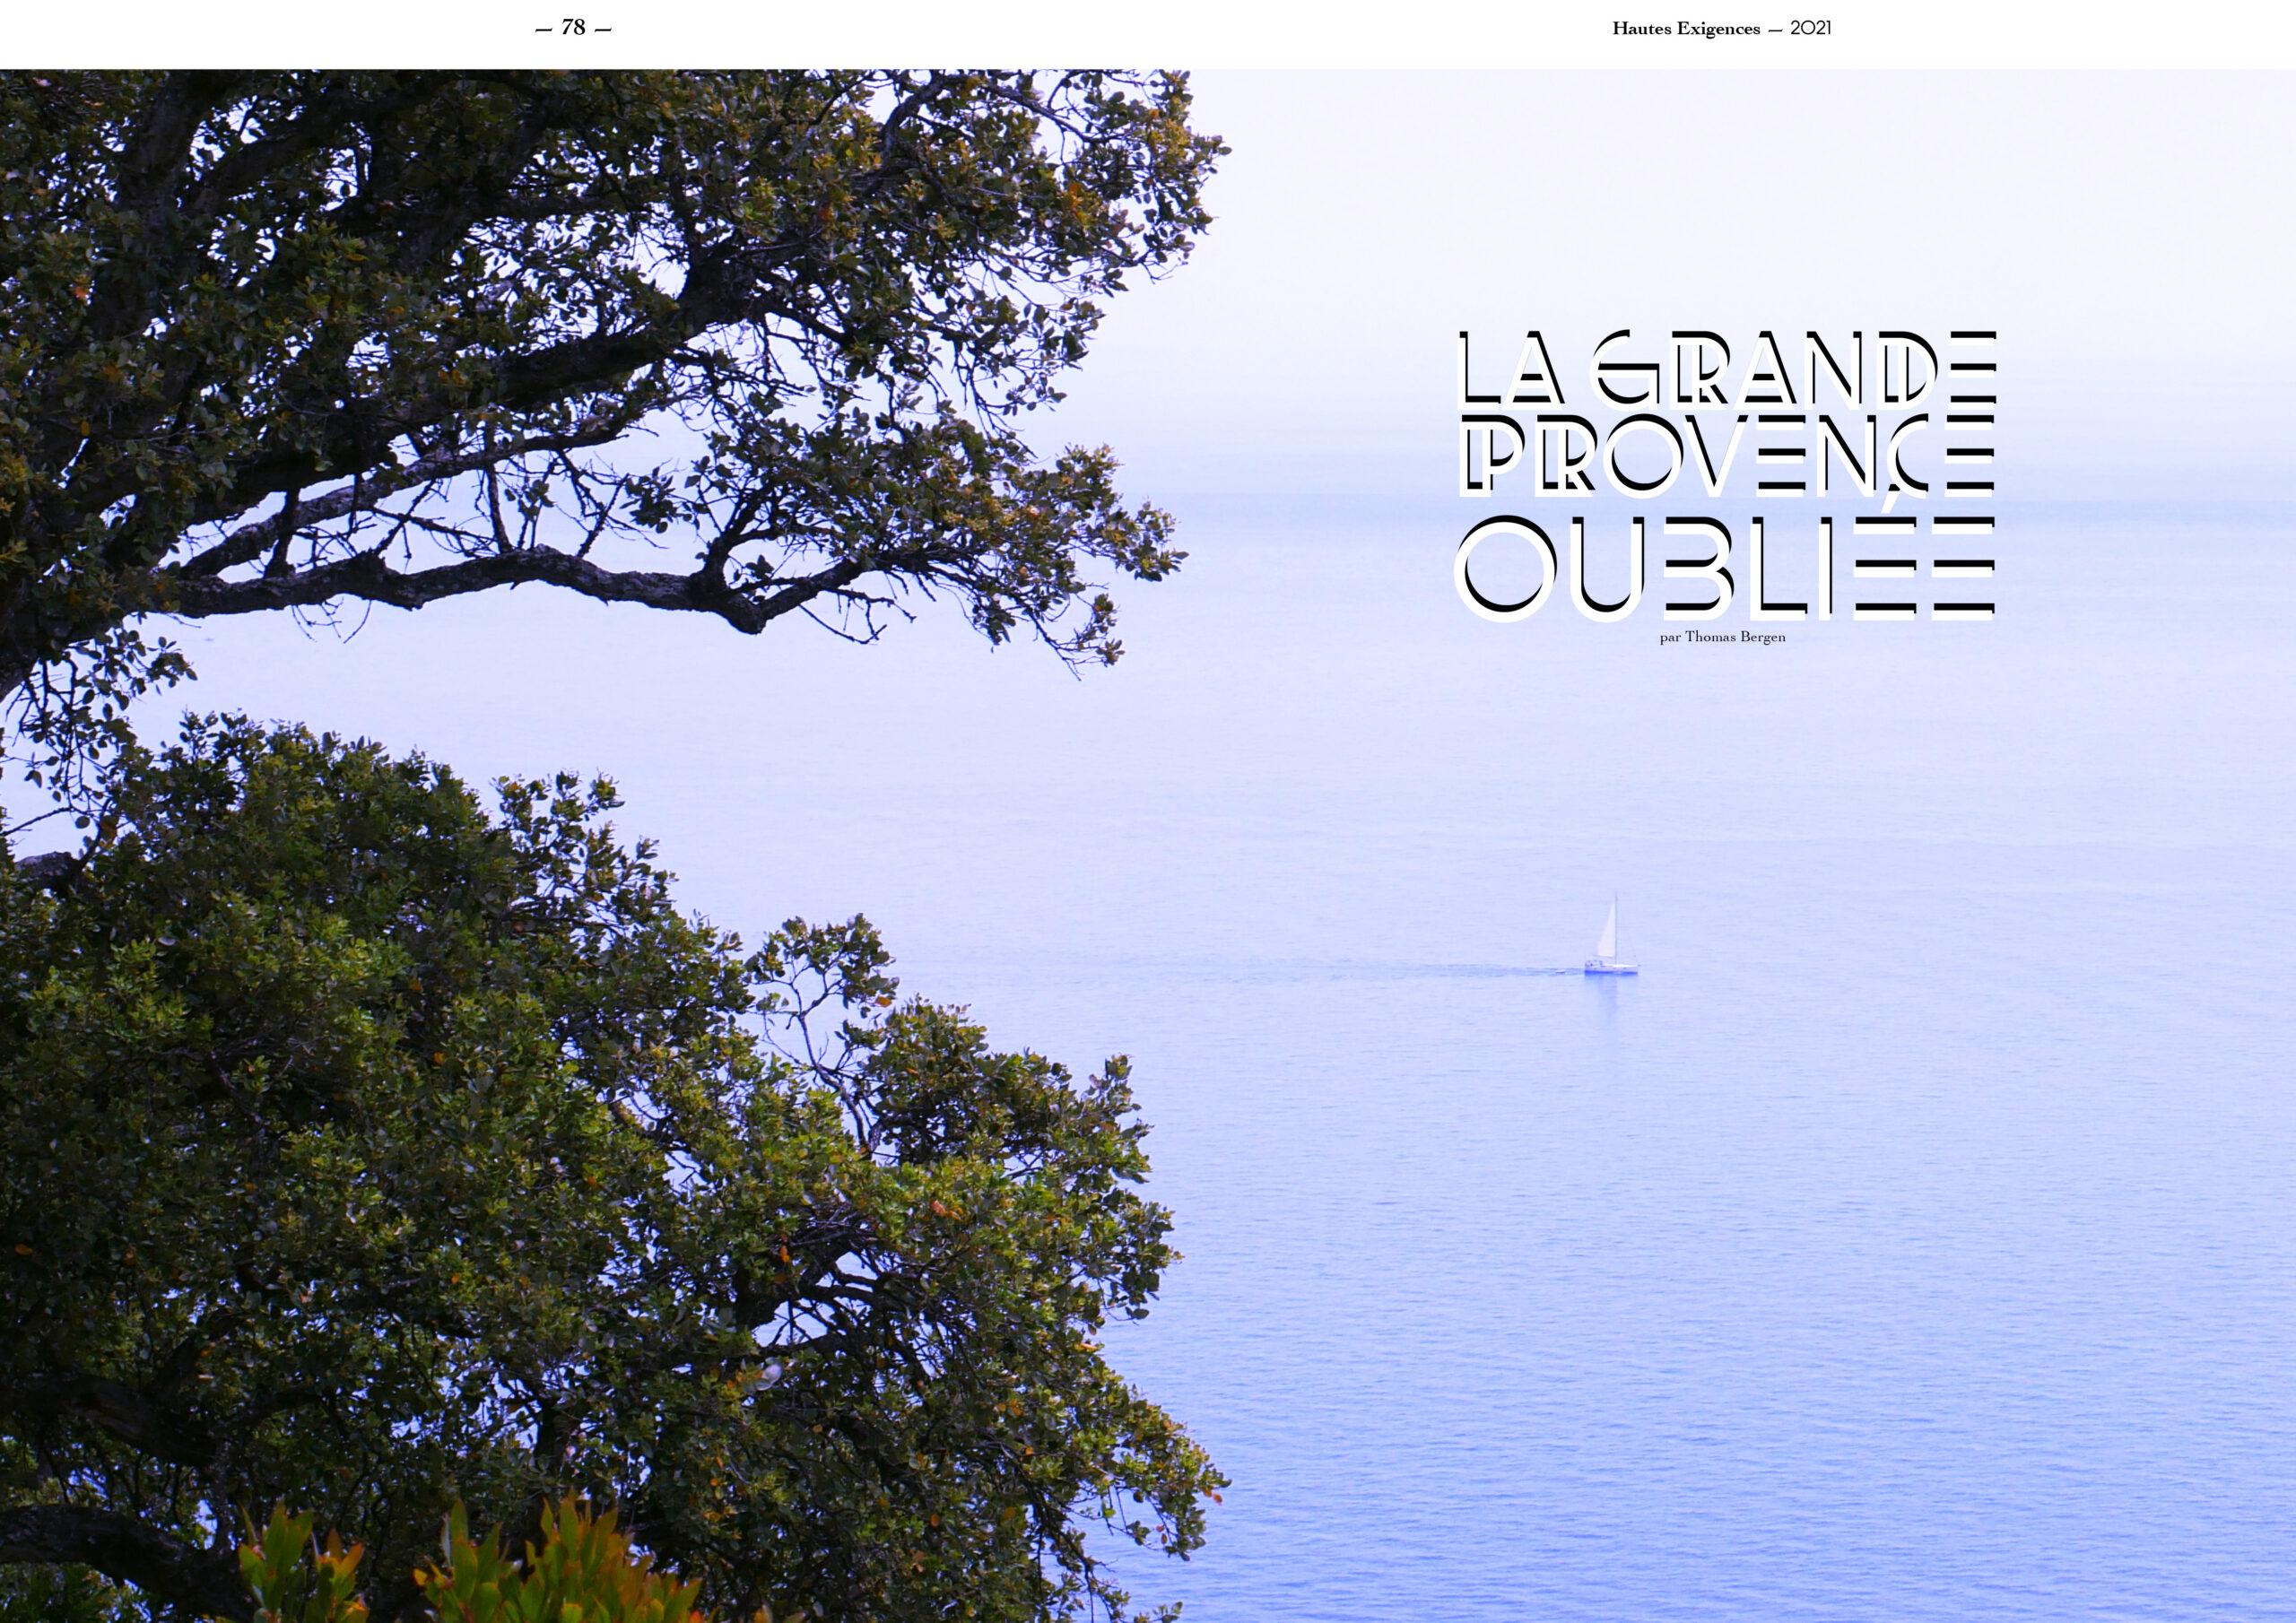 Hautes Exigences Magazine Hors Serie 2021 page 76-77